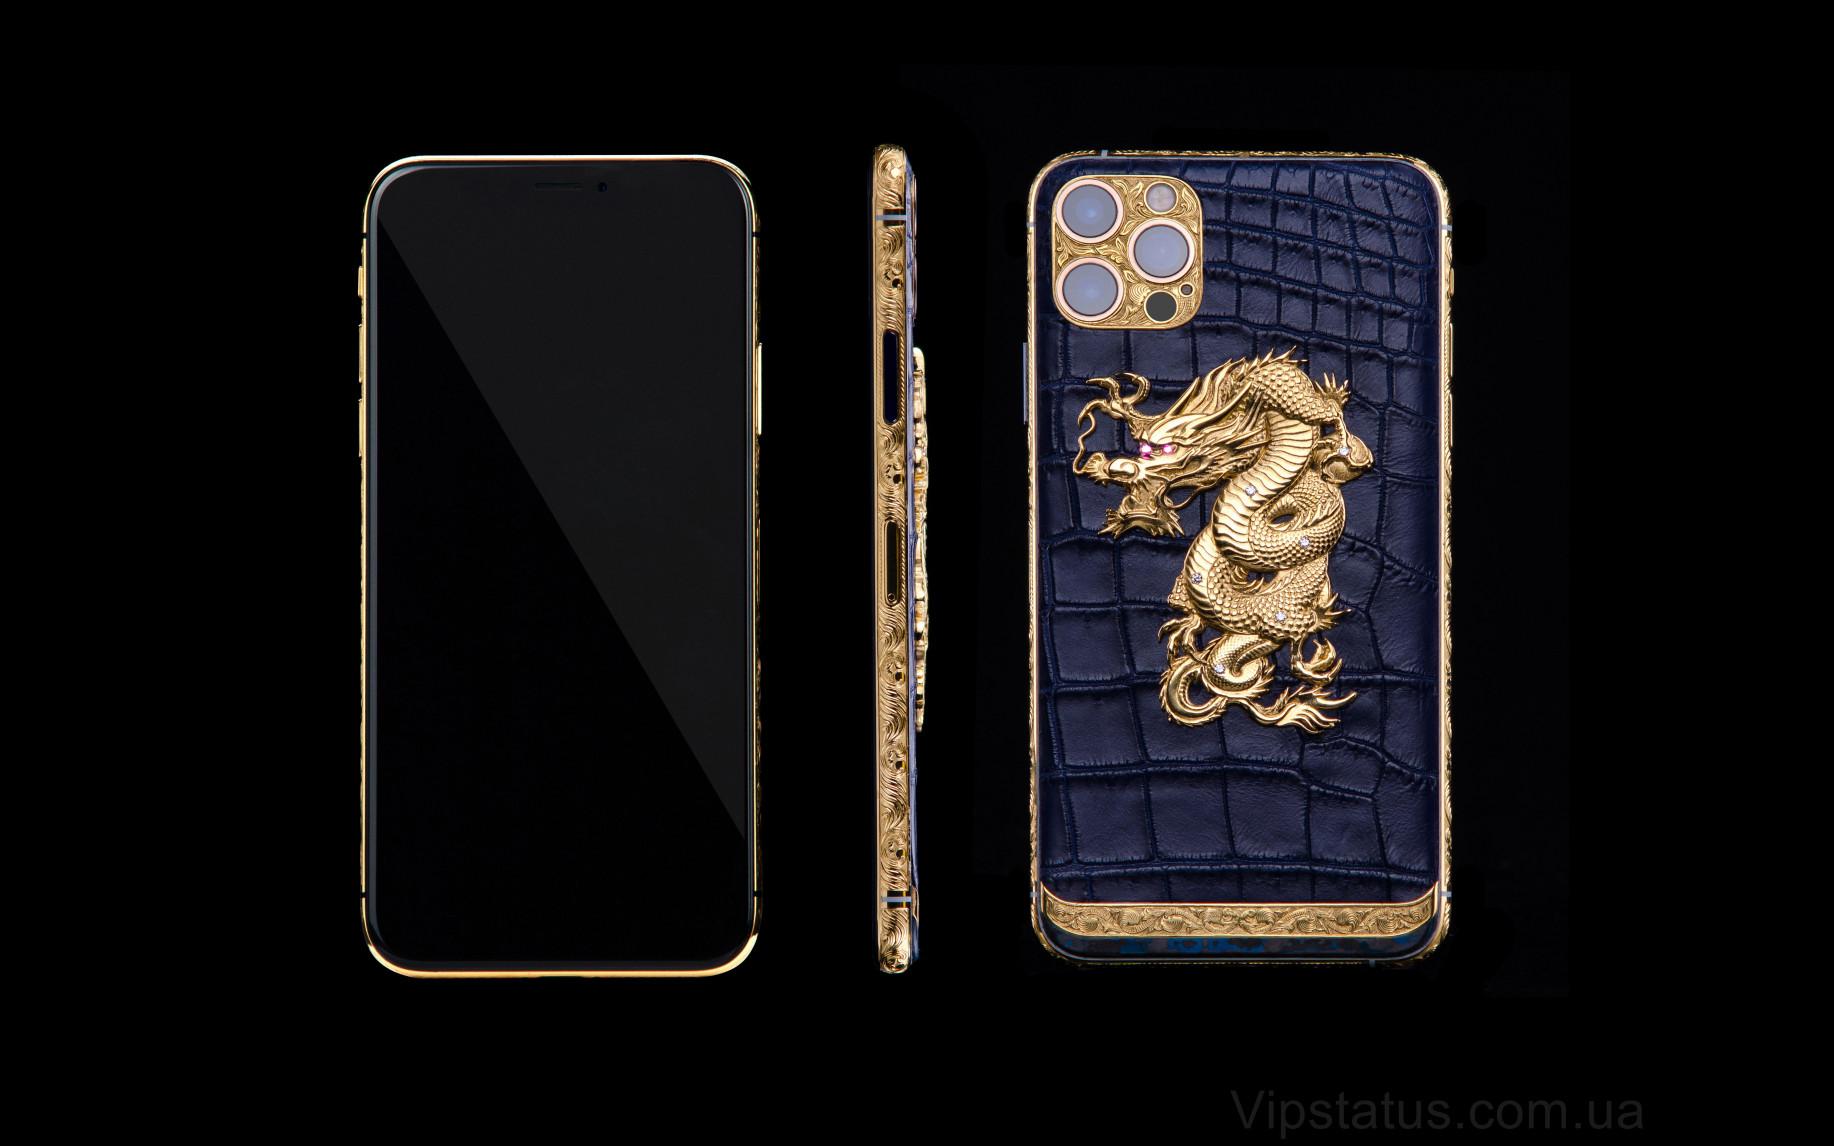 Elite Oriental Dragon IPHONE 12 PRO MAX 512 GB Oriental Dragon IPHONE 12 PRO MAX 512 GB image 4